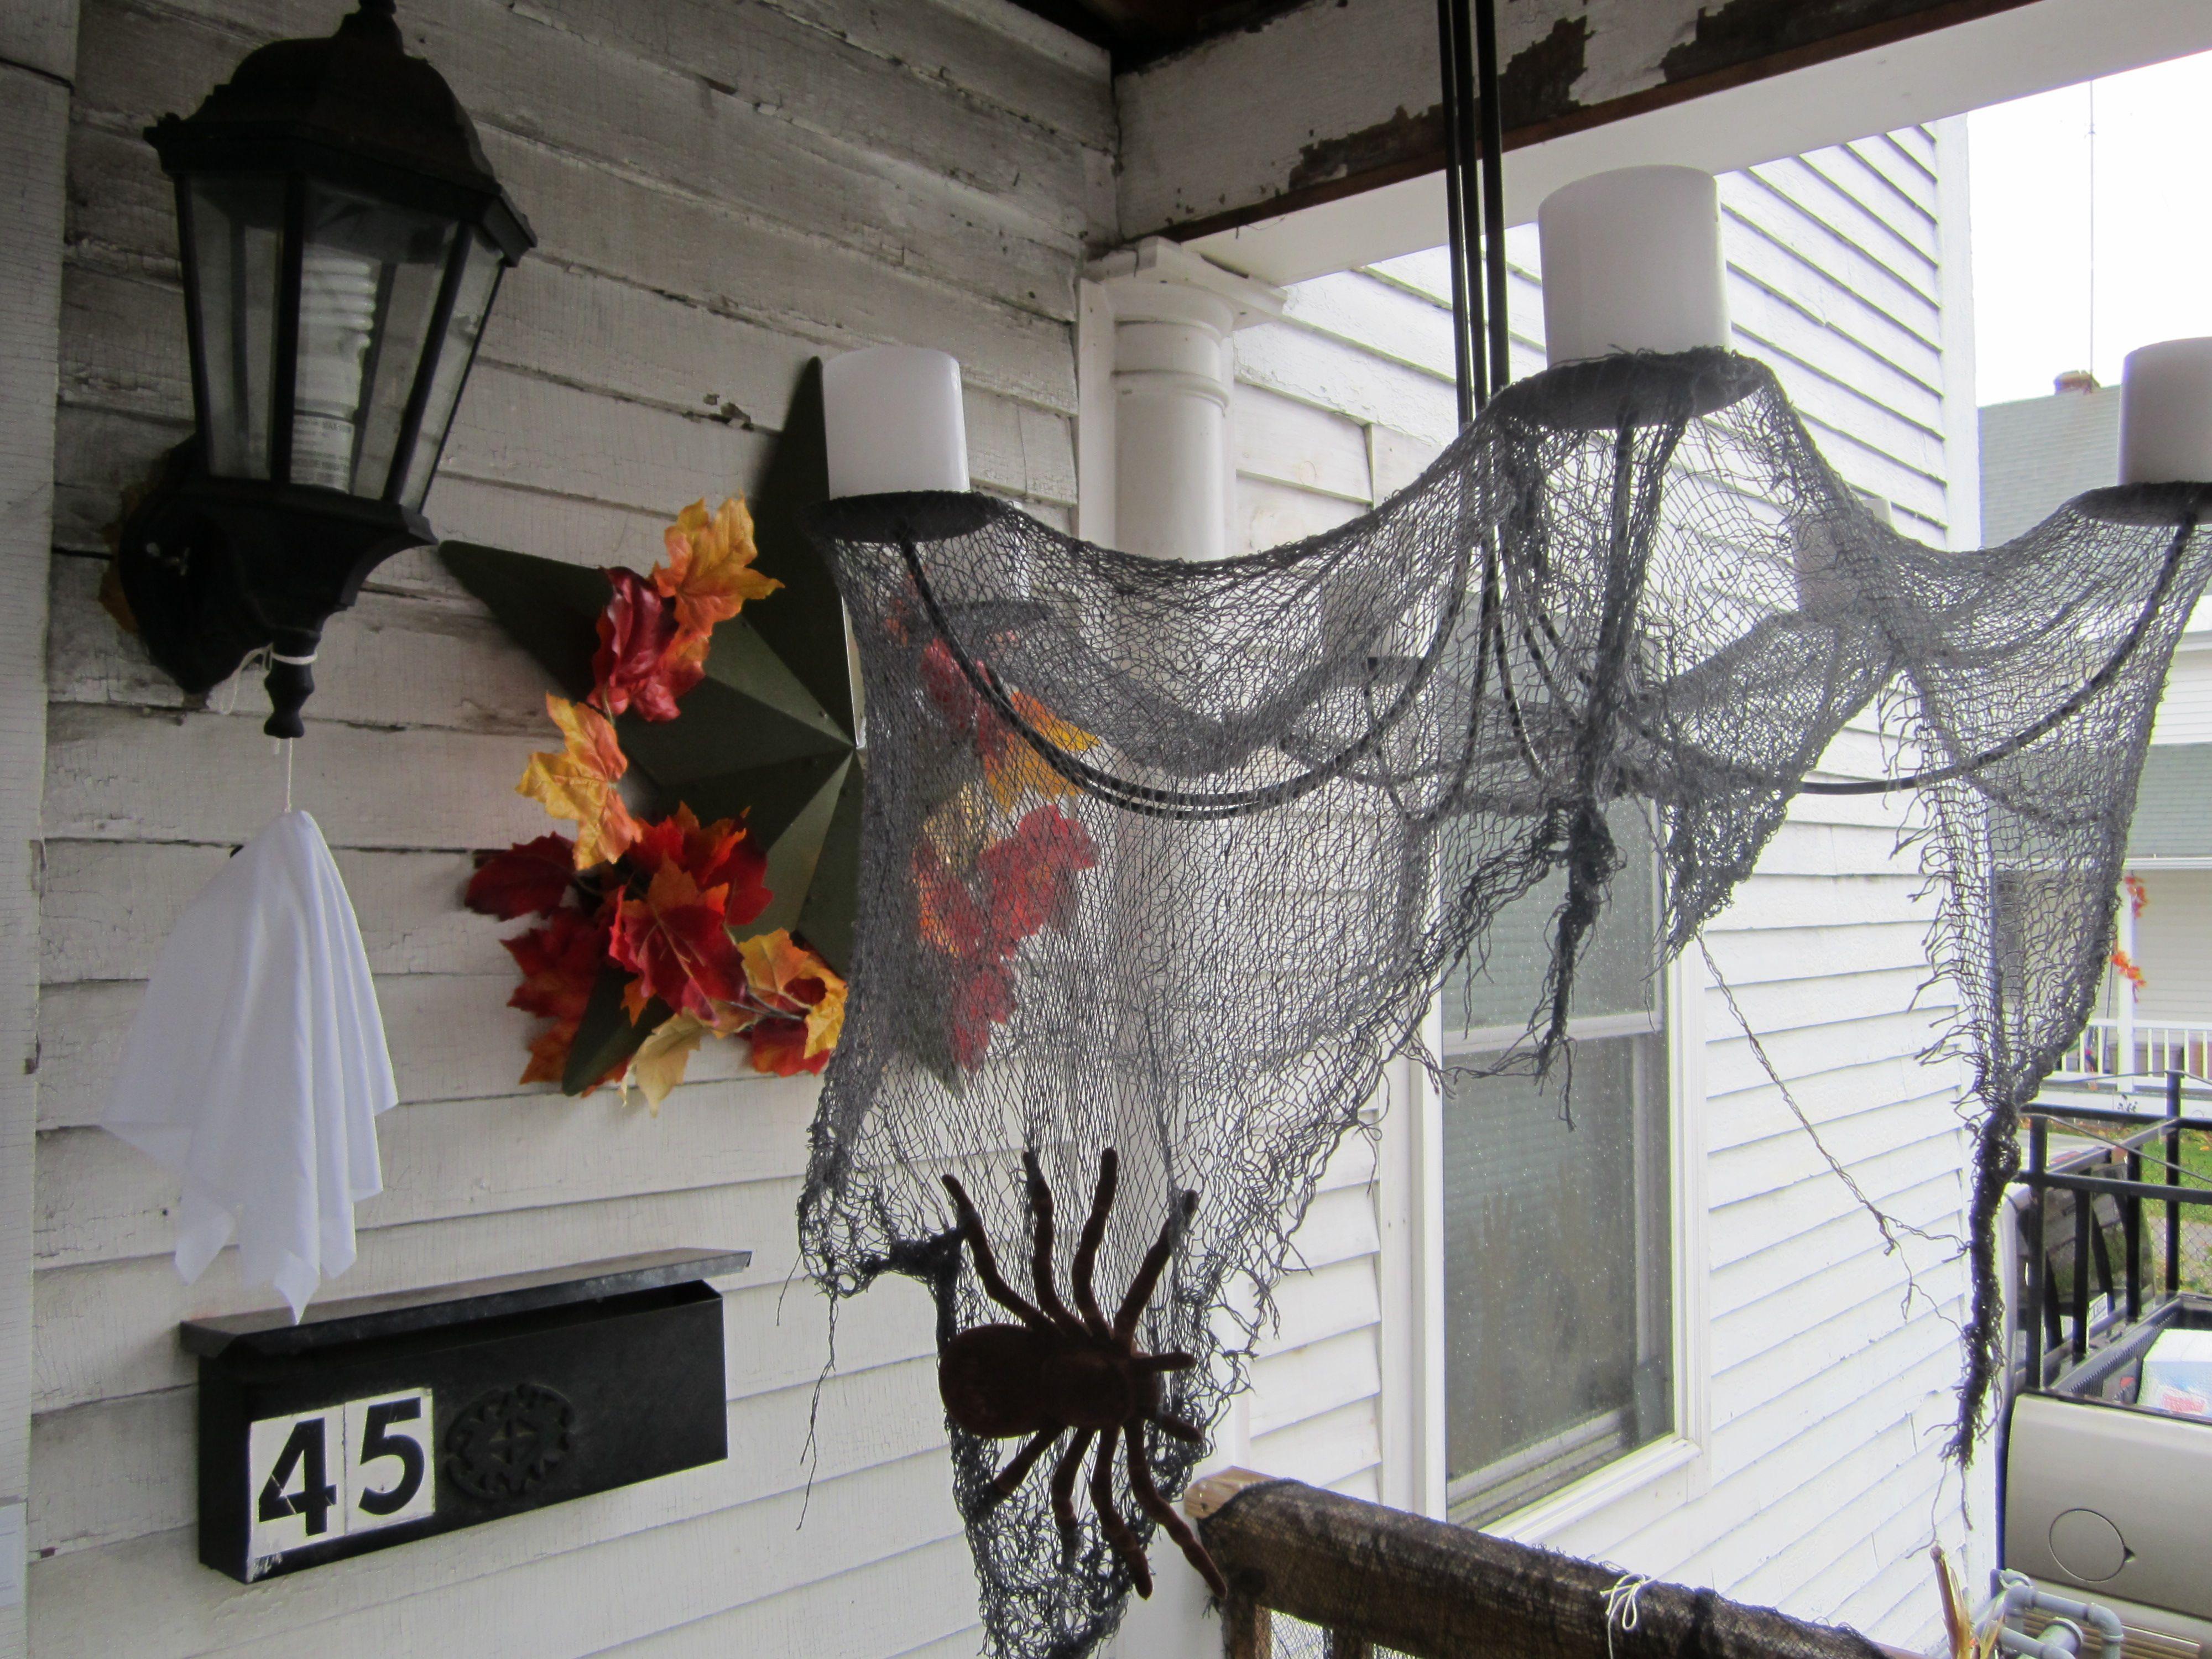 HALLOWEEN CREEPY CLOTH WINDOW TABLE DOOR SPOOKY FANCY DRESS PARTY DECORATION